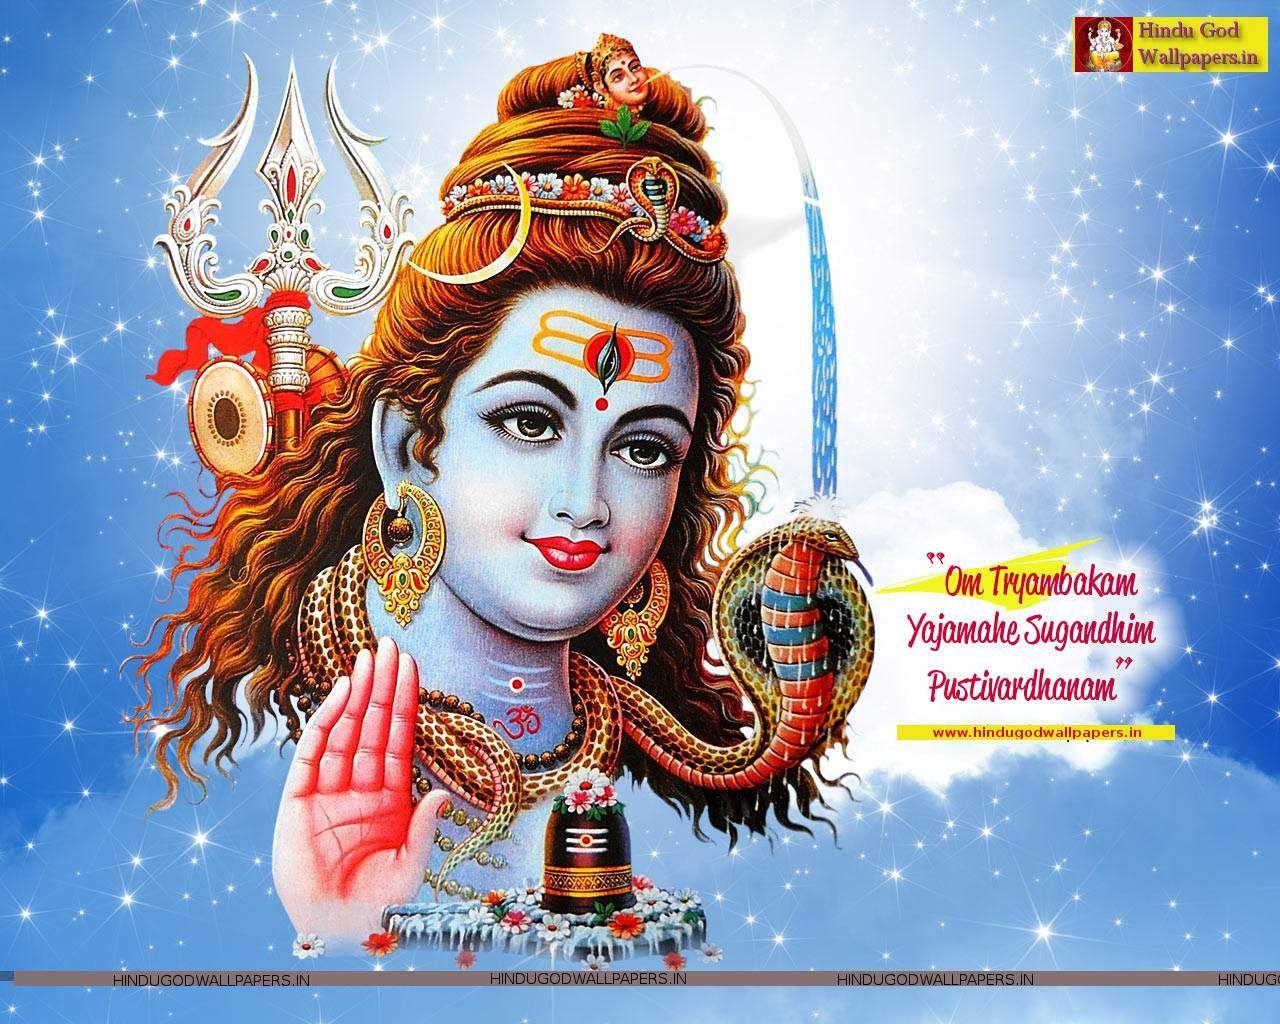 Wallpaper download karna hai - Free Collection Of Latest Shiva Wallpaper For Desktop Download Also Get Hd Shiva Wallpaper For